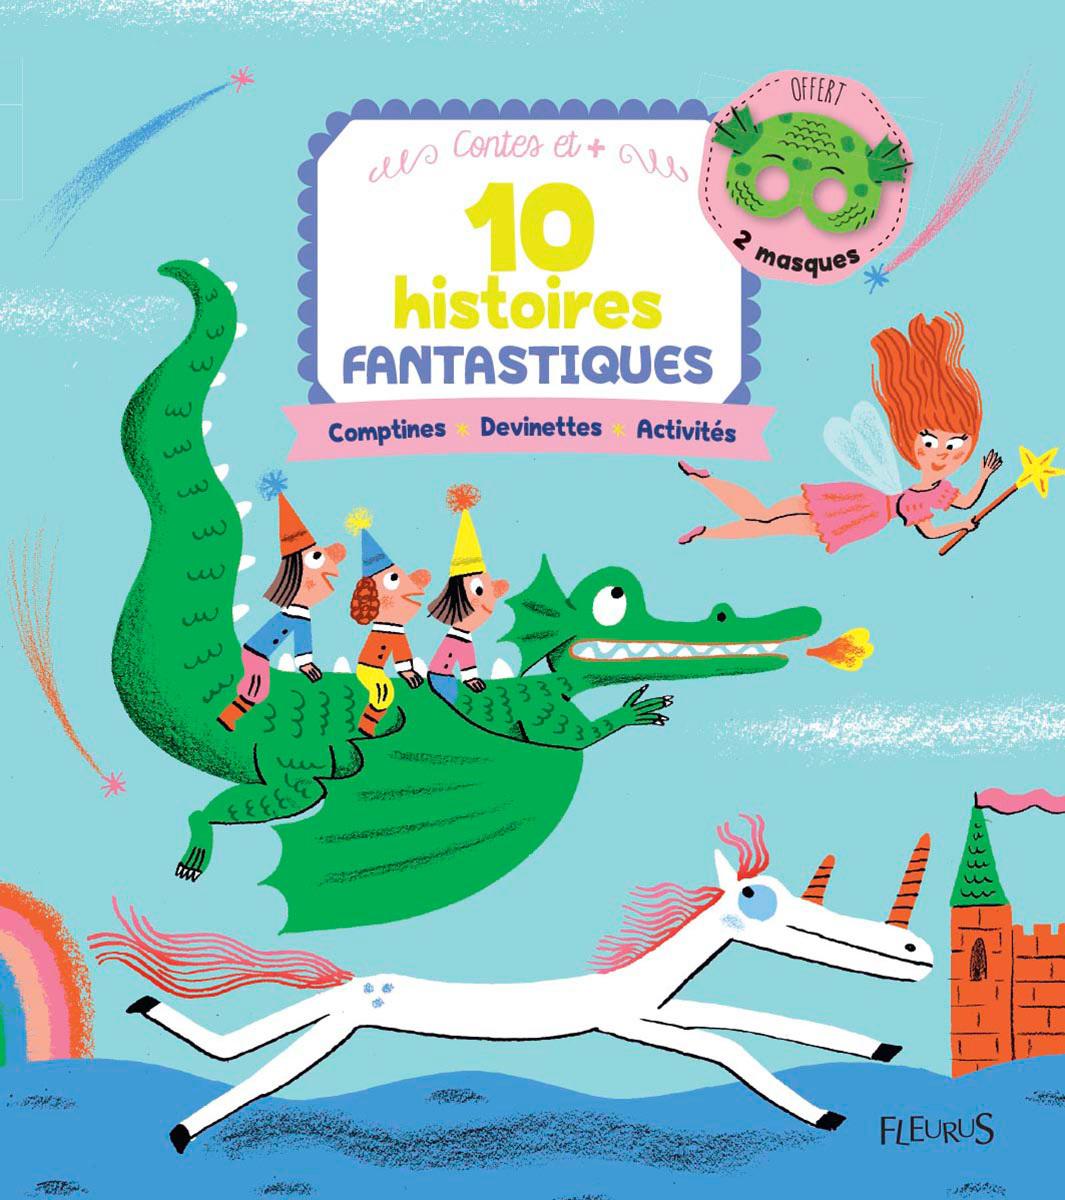 10 HISTOIRES FANTASTIQUES